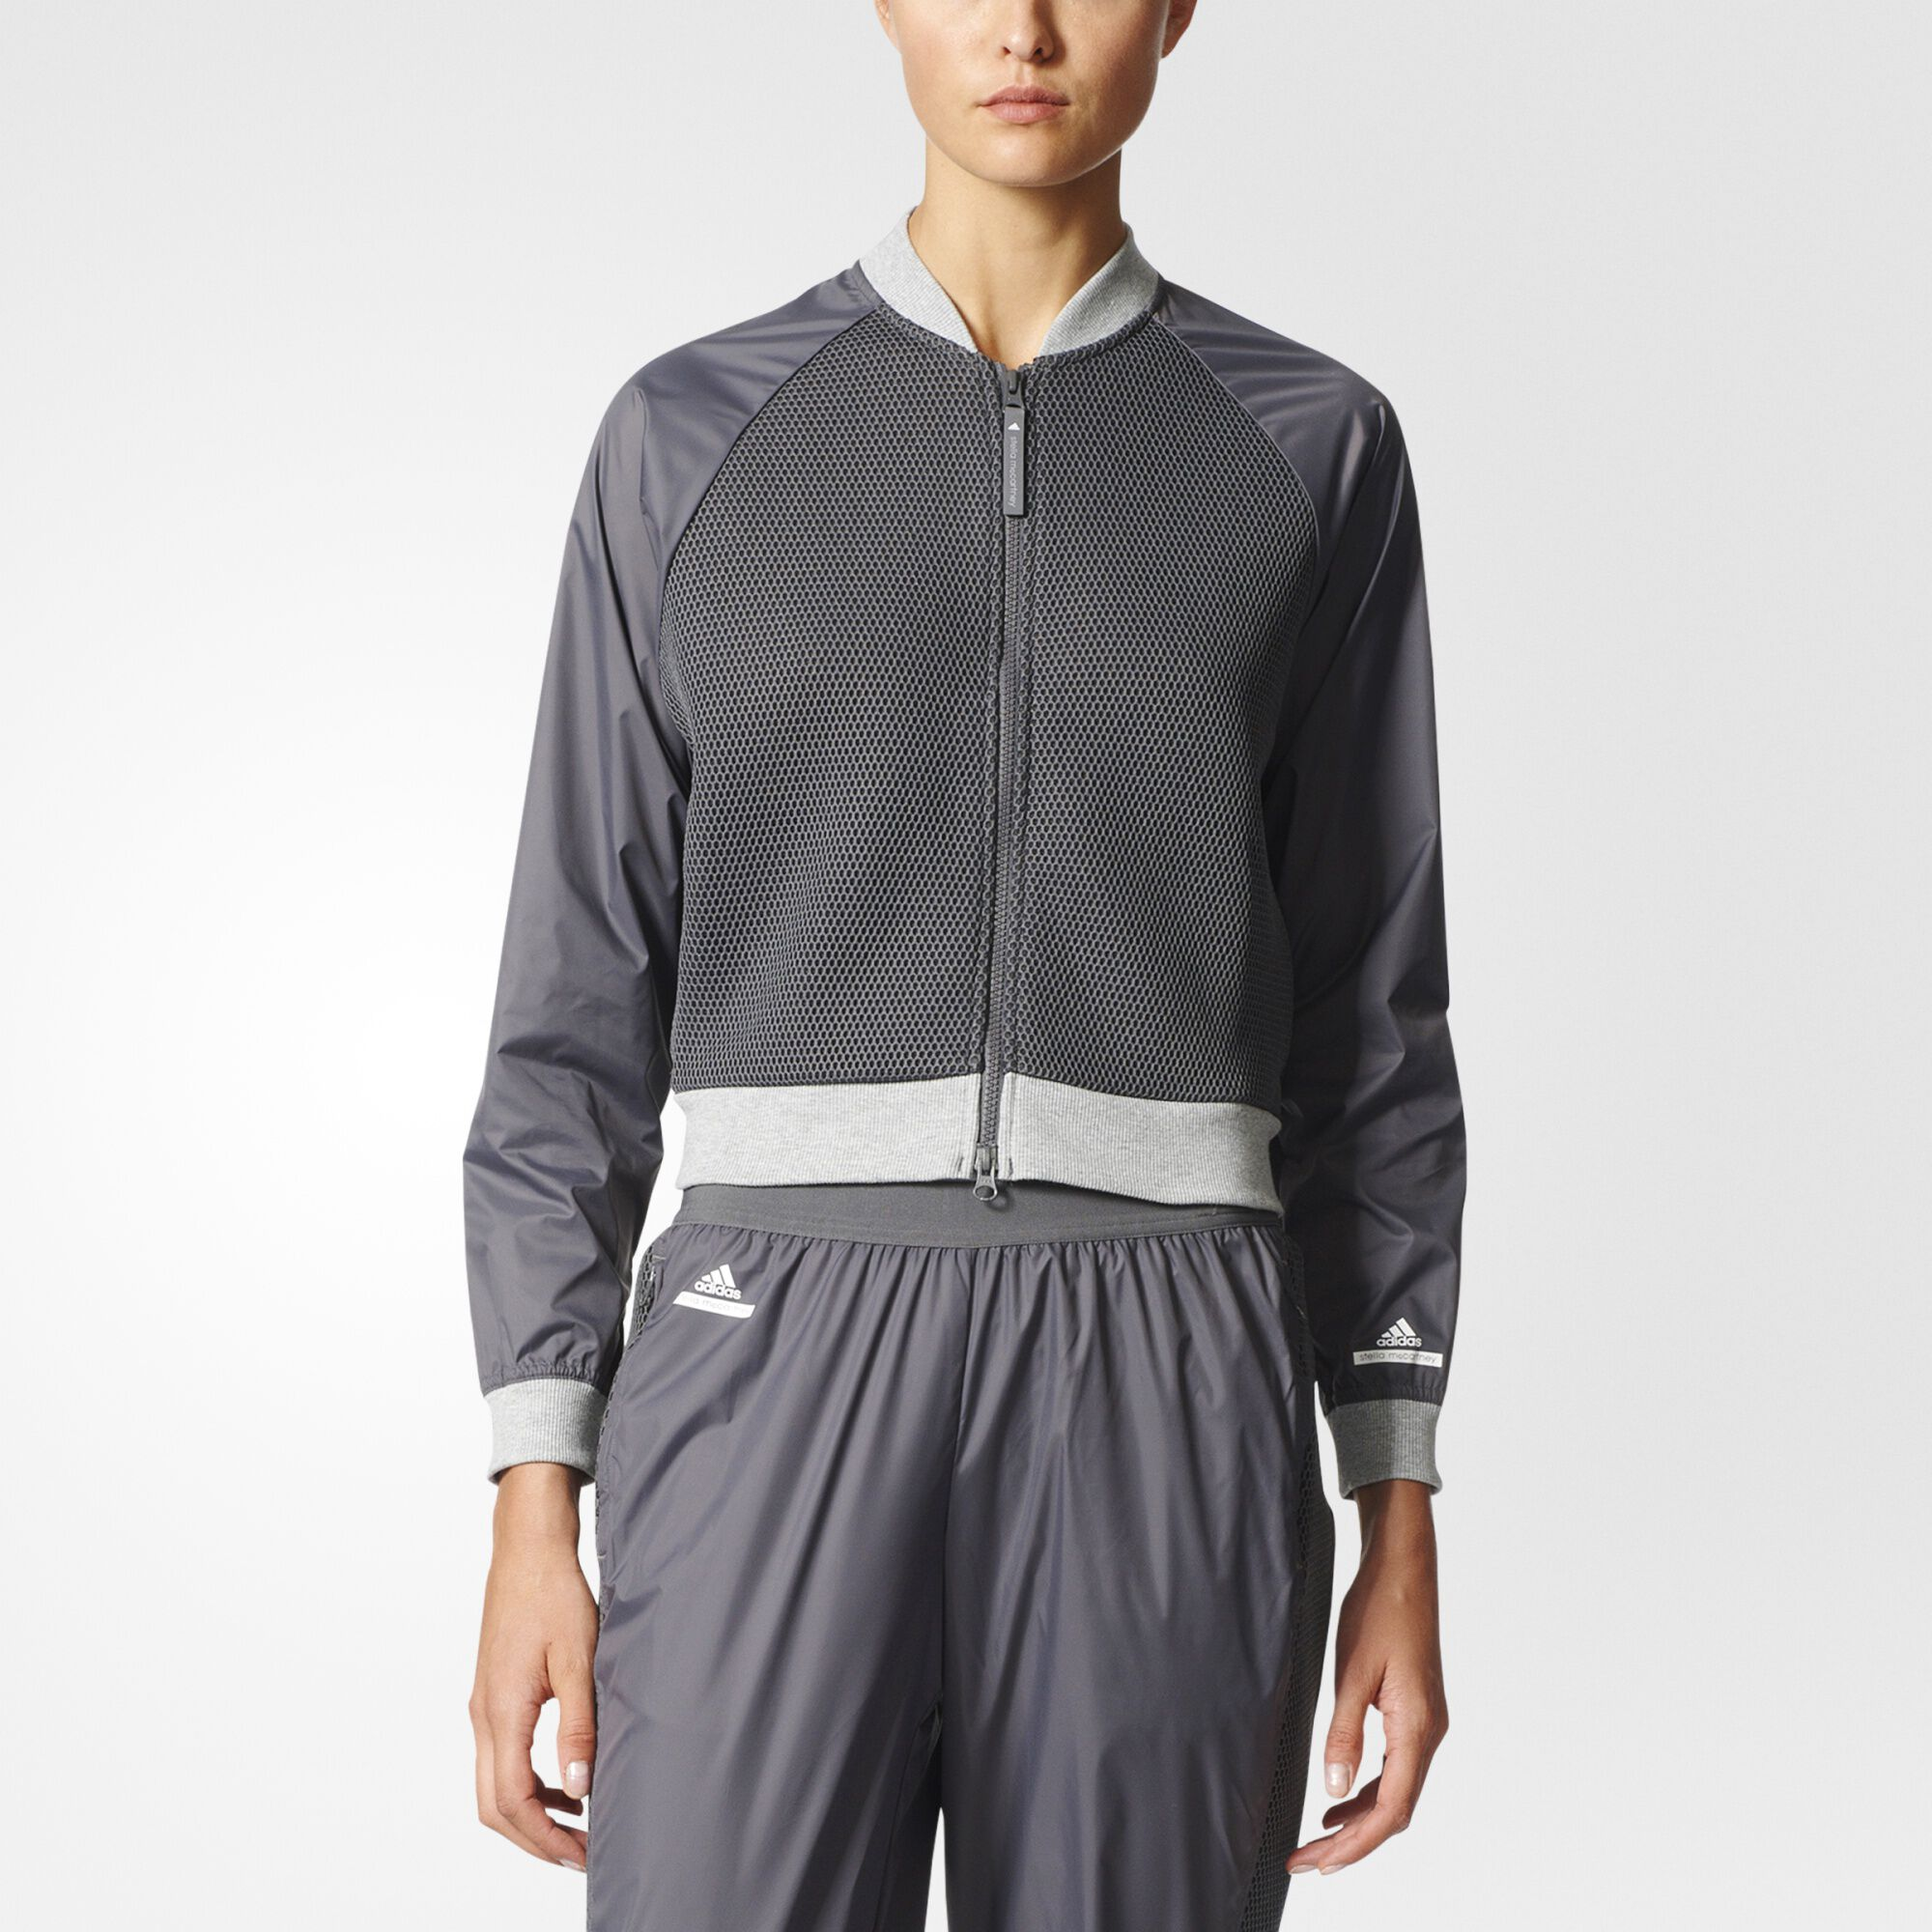 adidas mens barricade tennis jacket